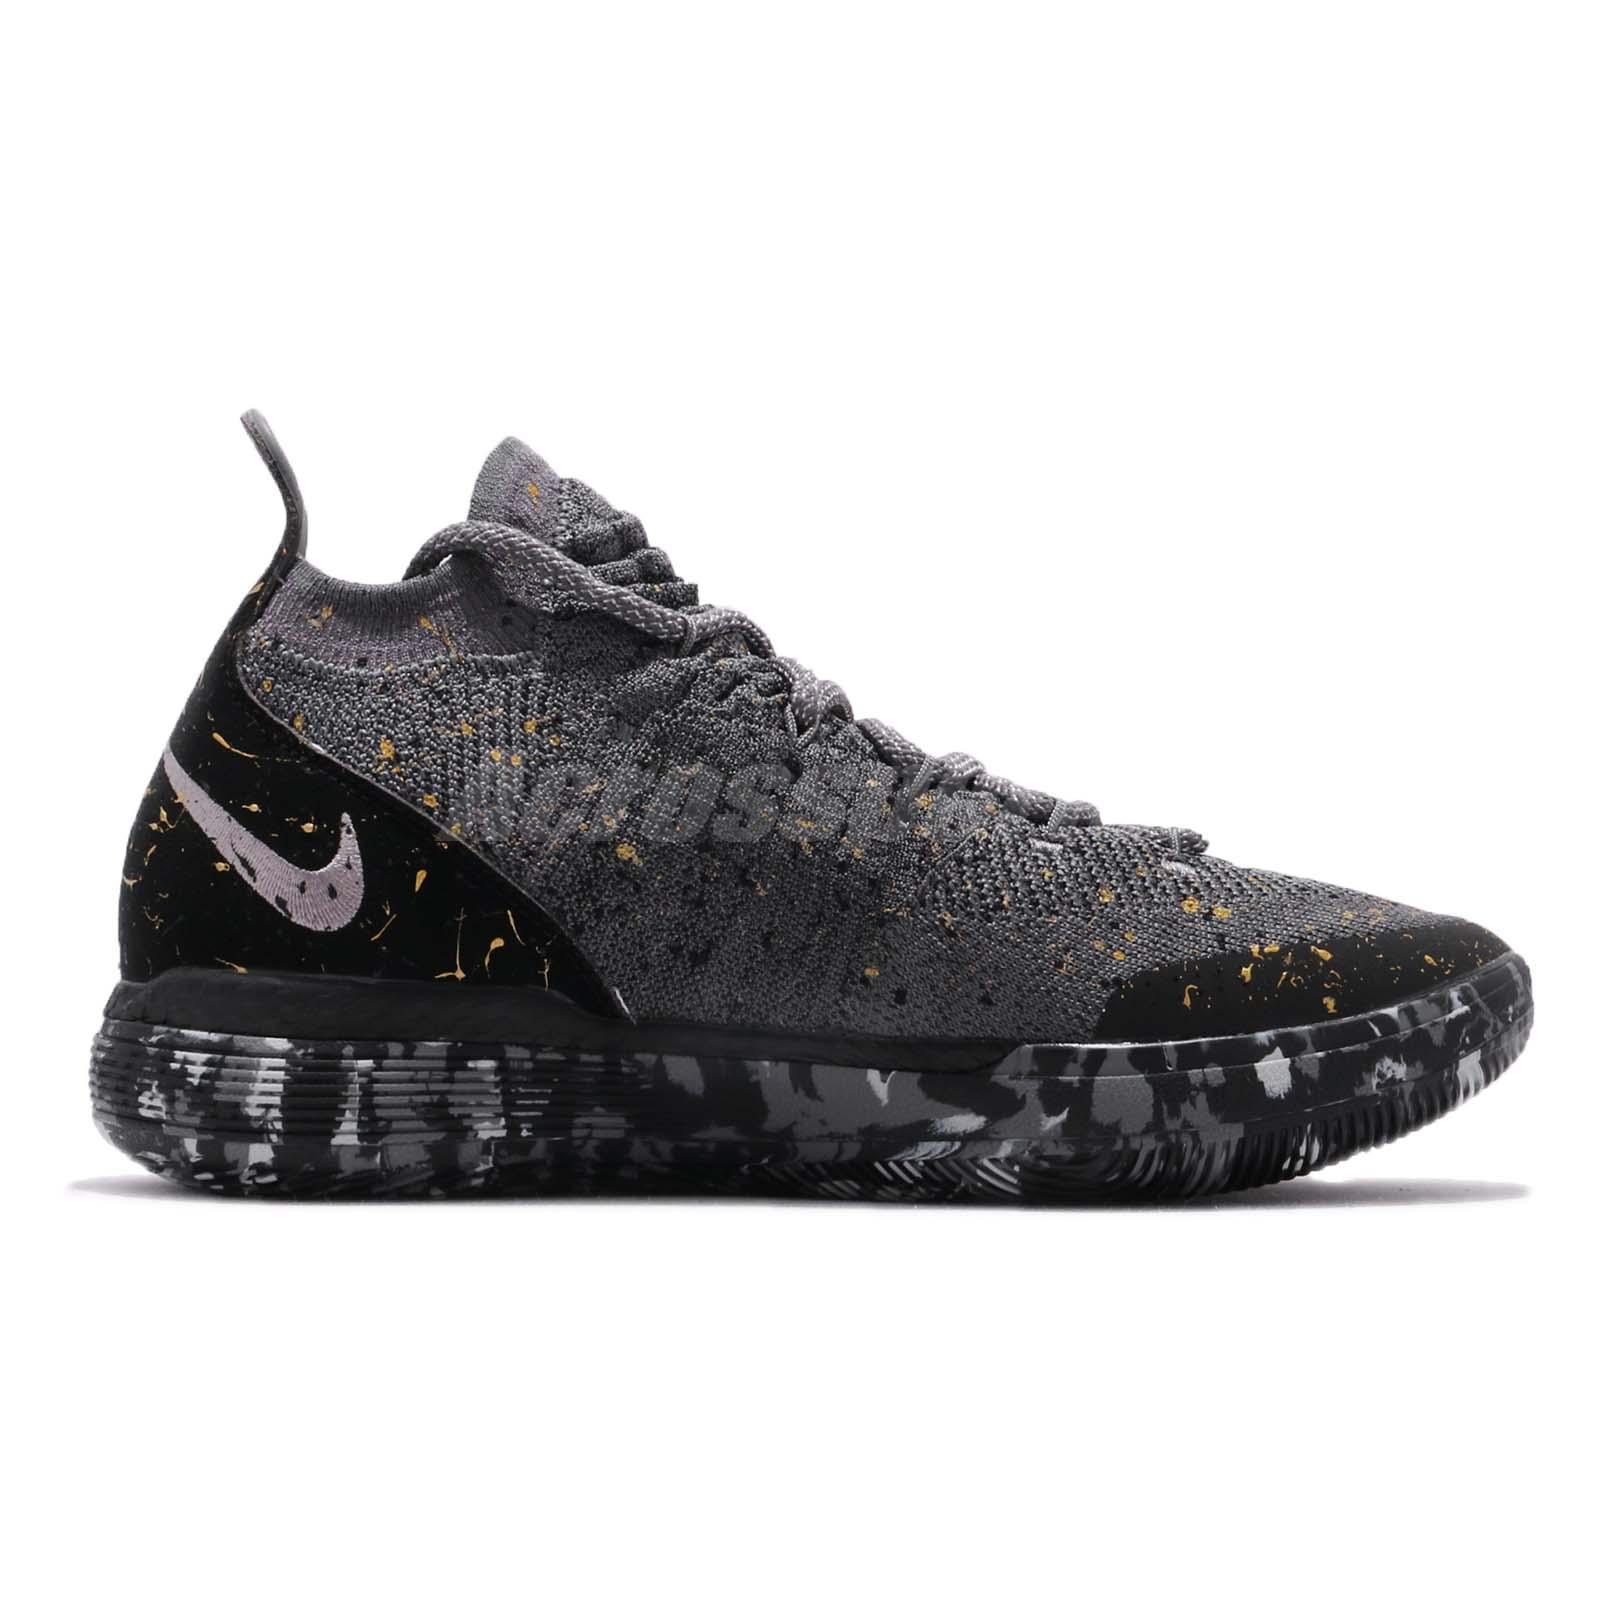 Nike Zoom KD11 EP Kevin Durant Black Gold Splatter Basketball Shoes ... 48aa47441515